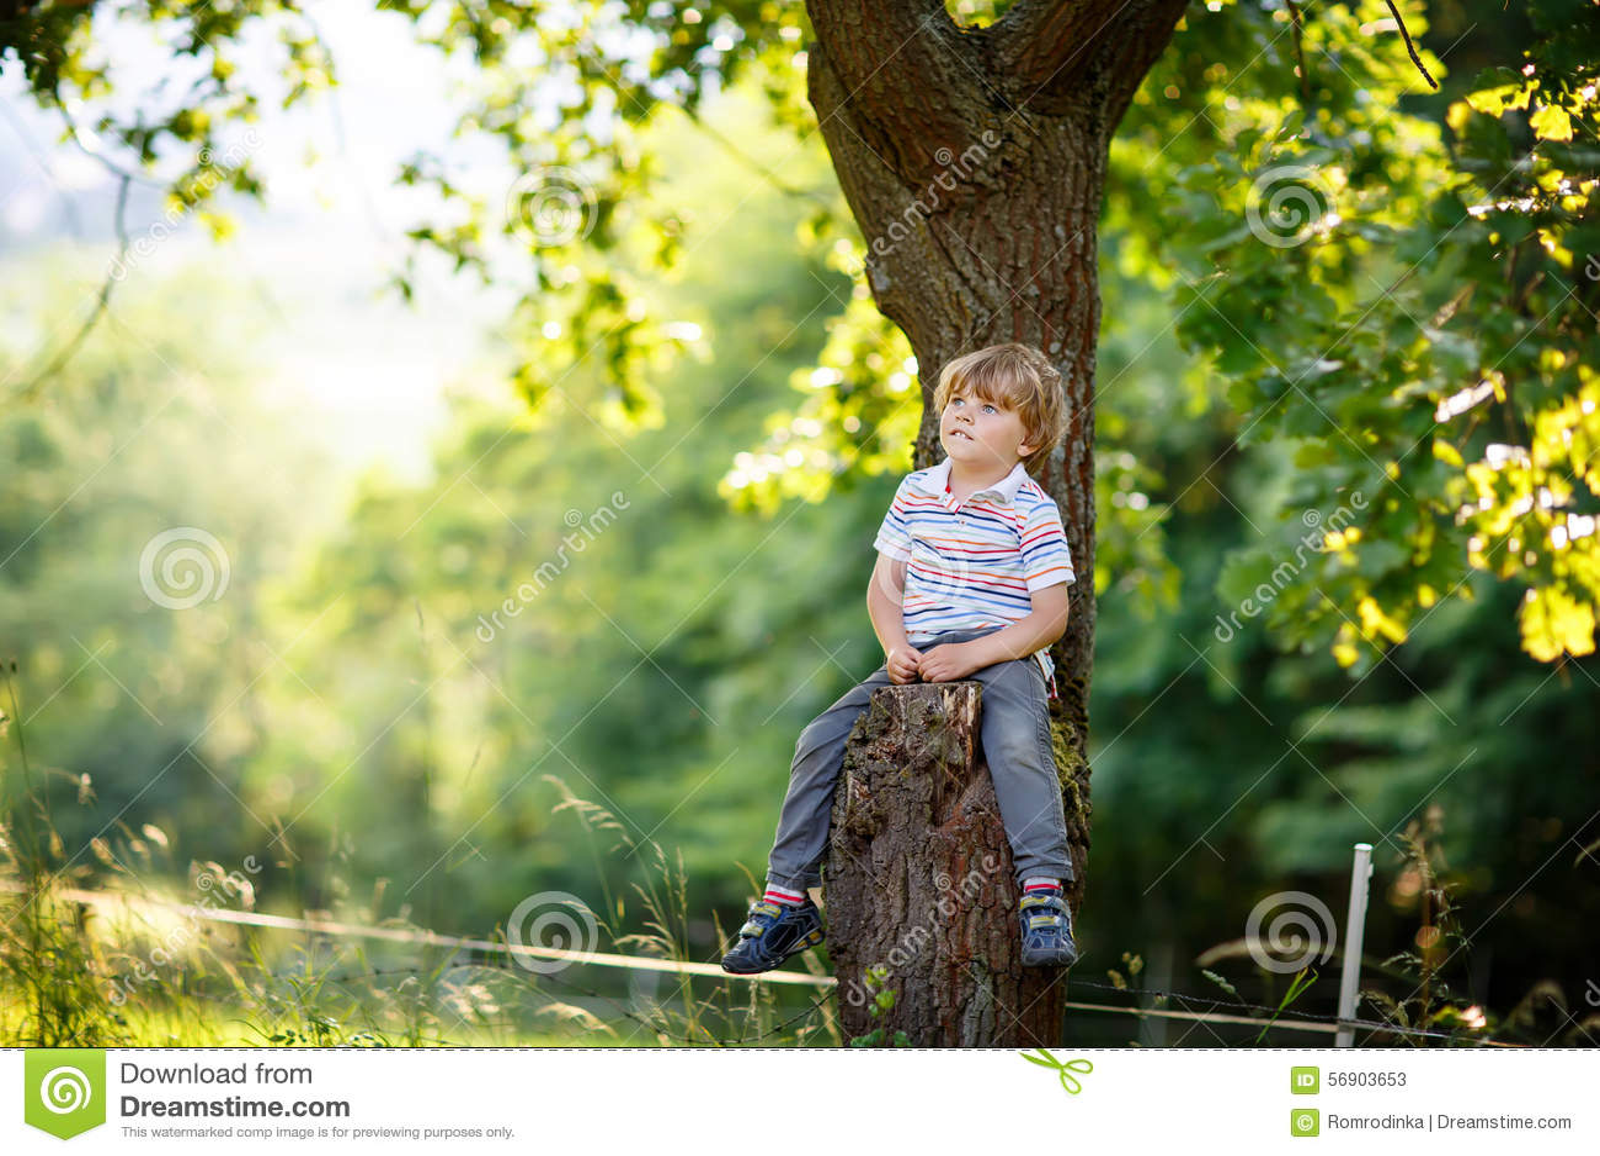 Cute little kid boy enjoying climbing on tree